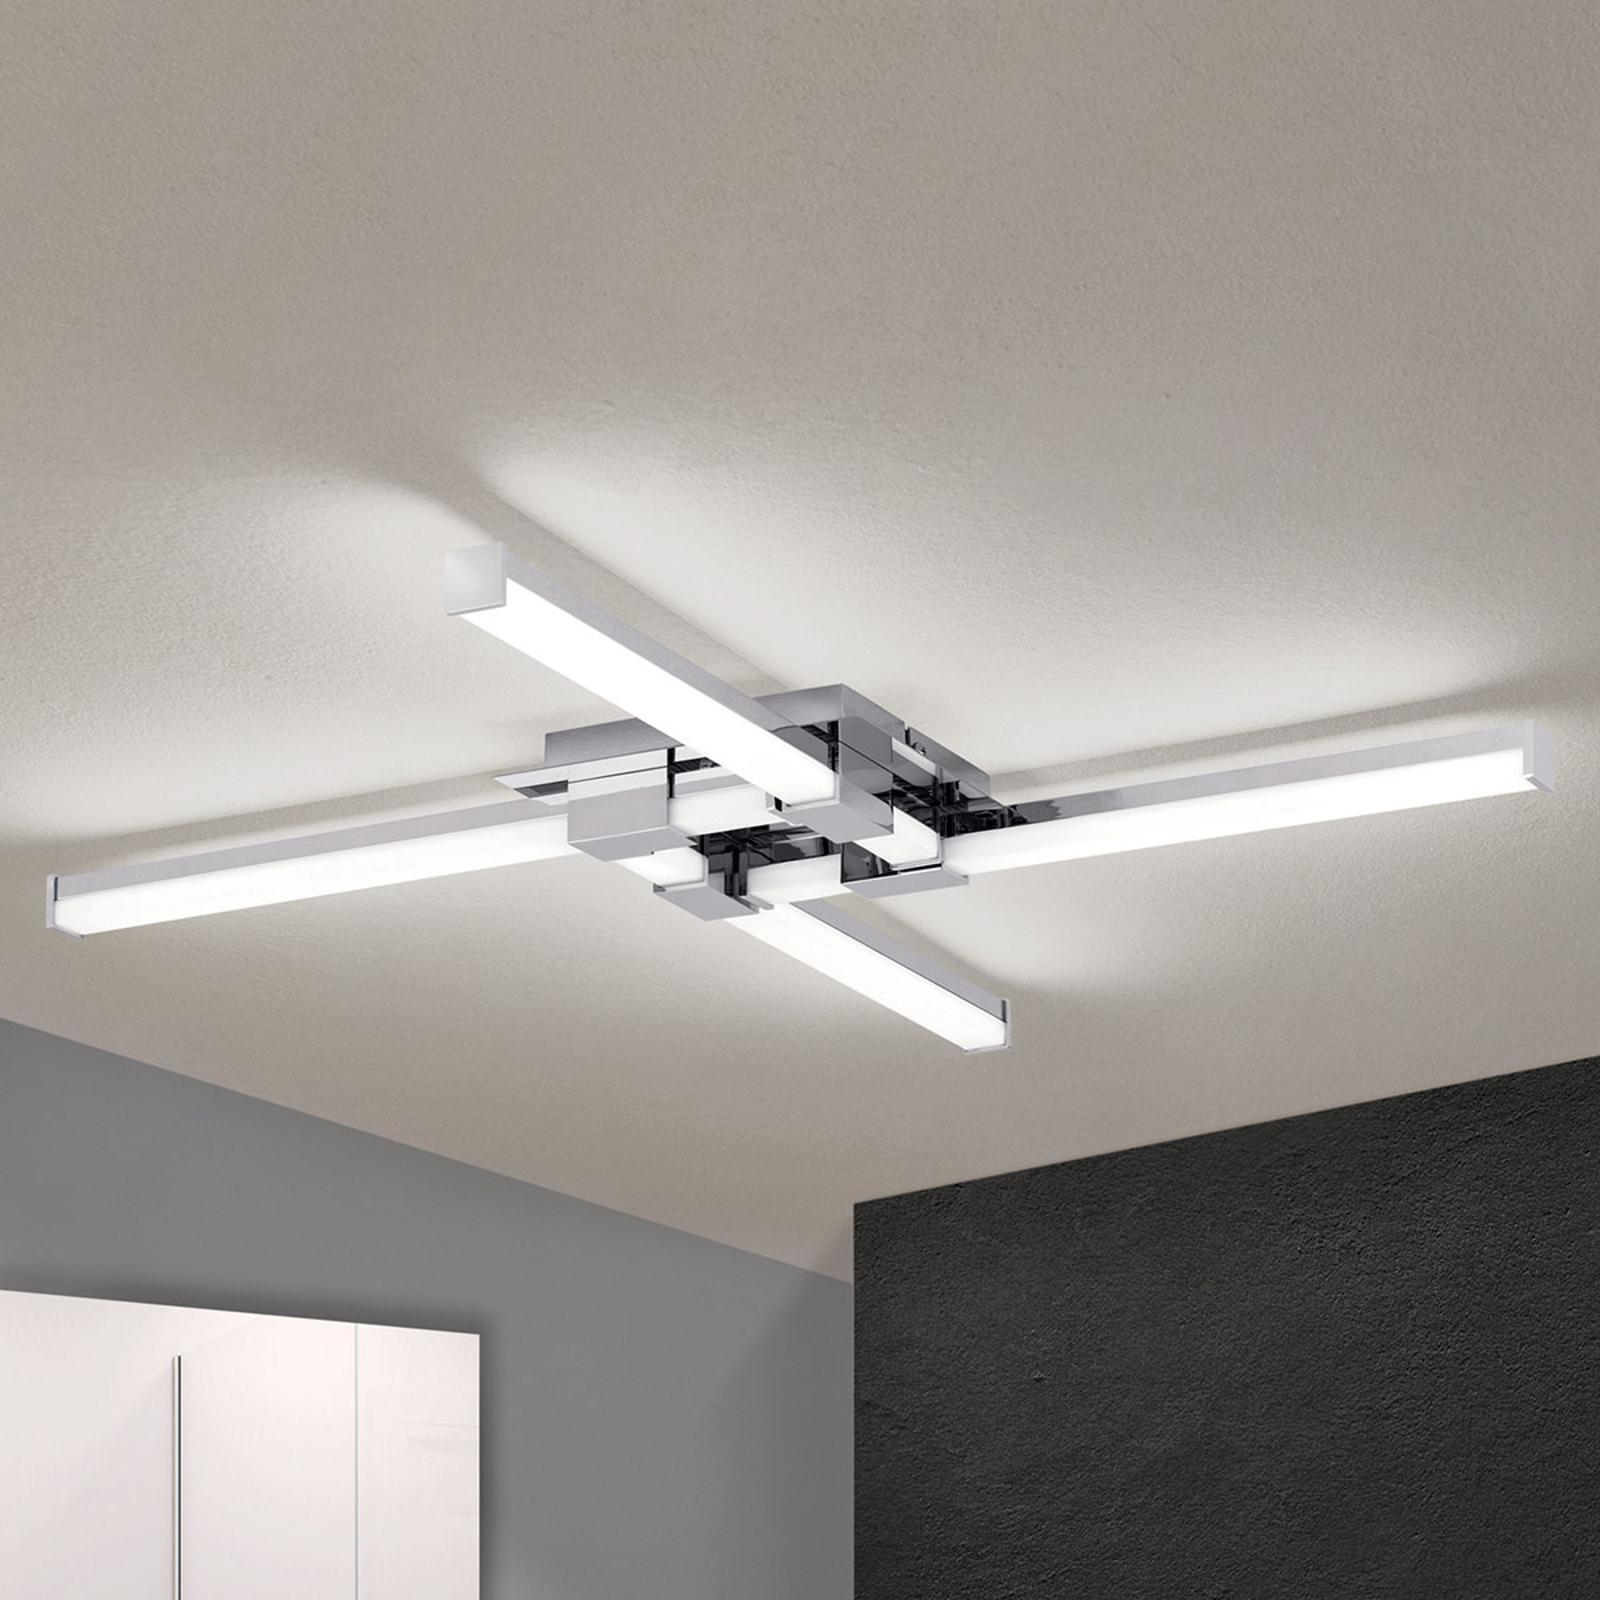 LED-taklampe til bad Argo med fire lyskilder